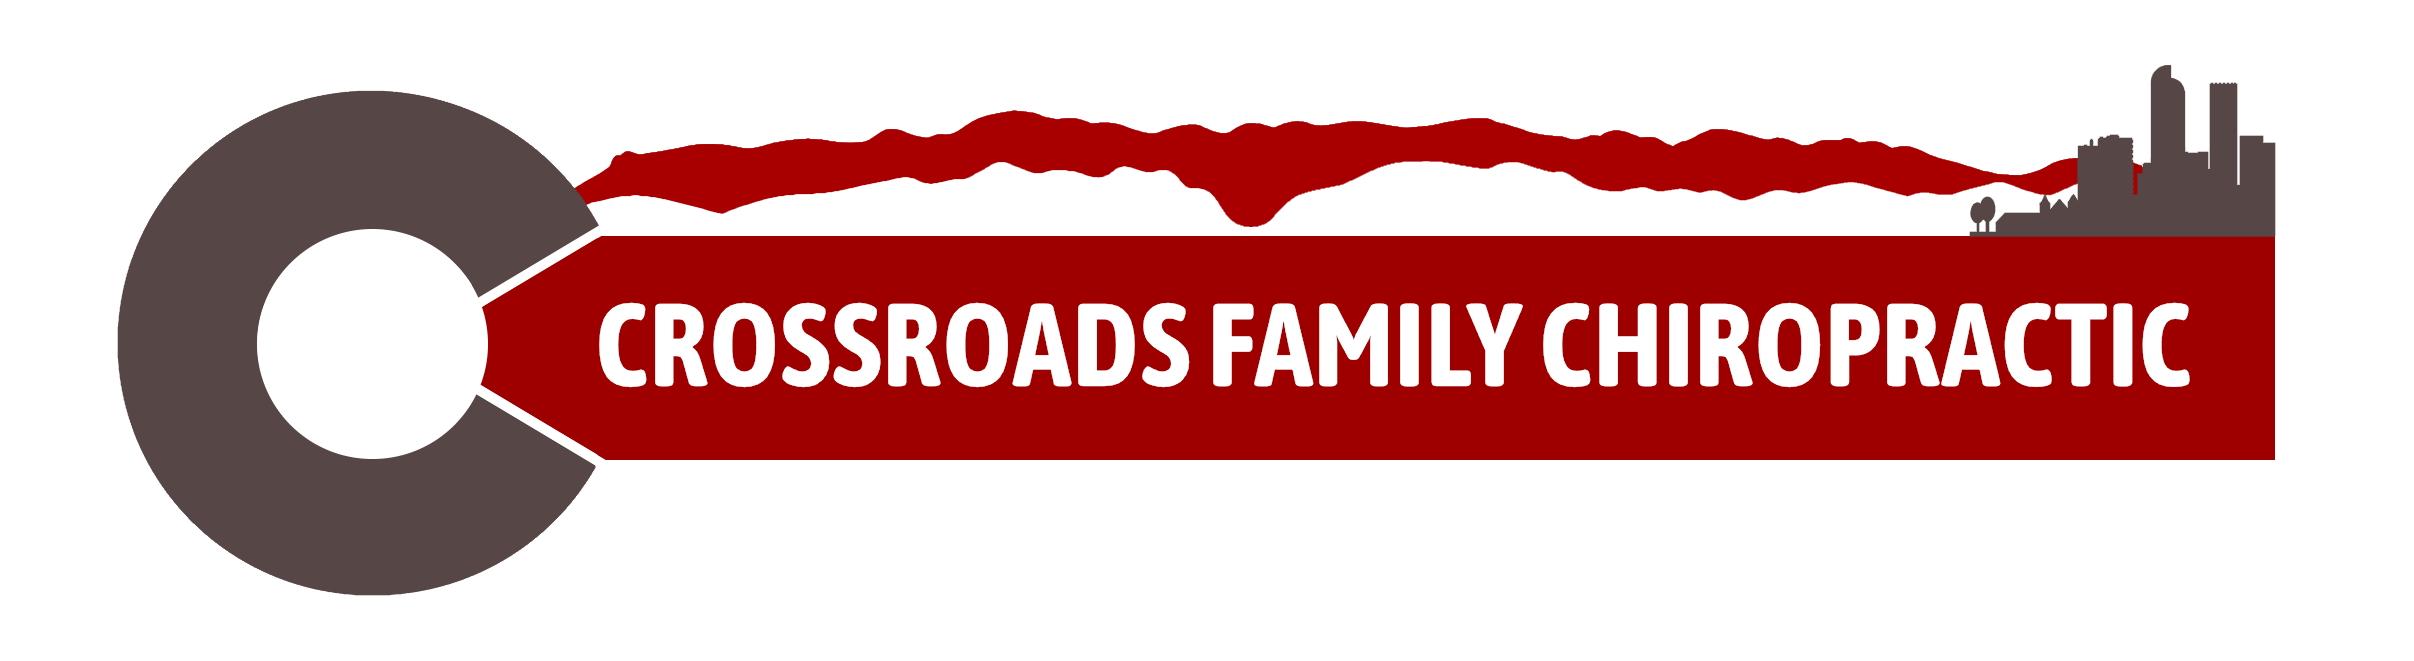 Crossroads Family Chiropractic